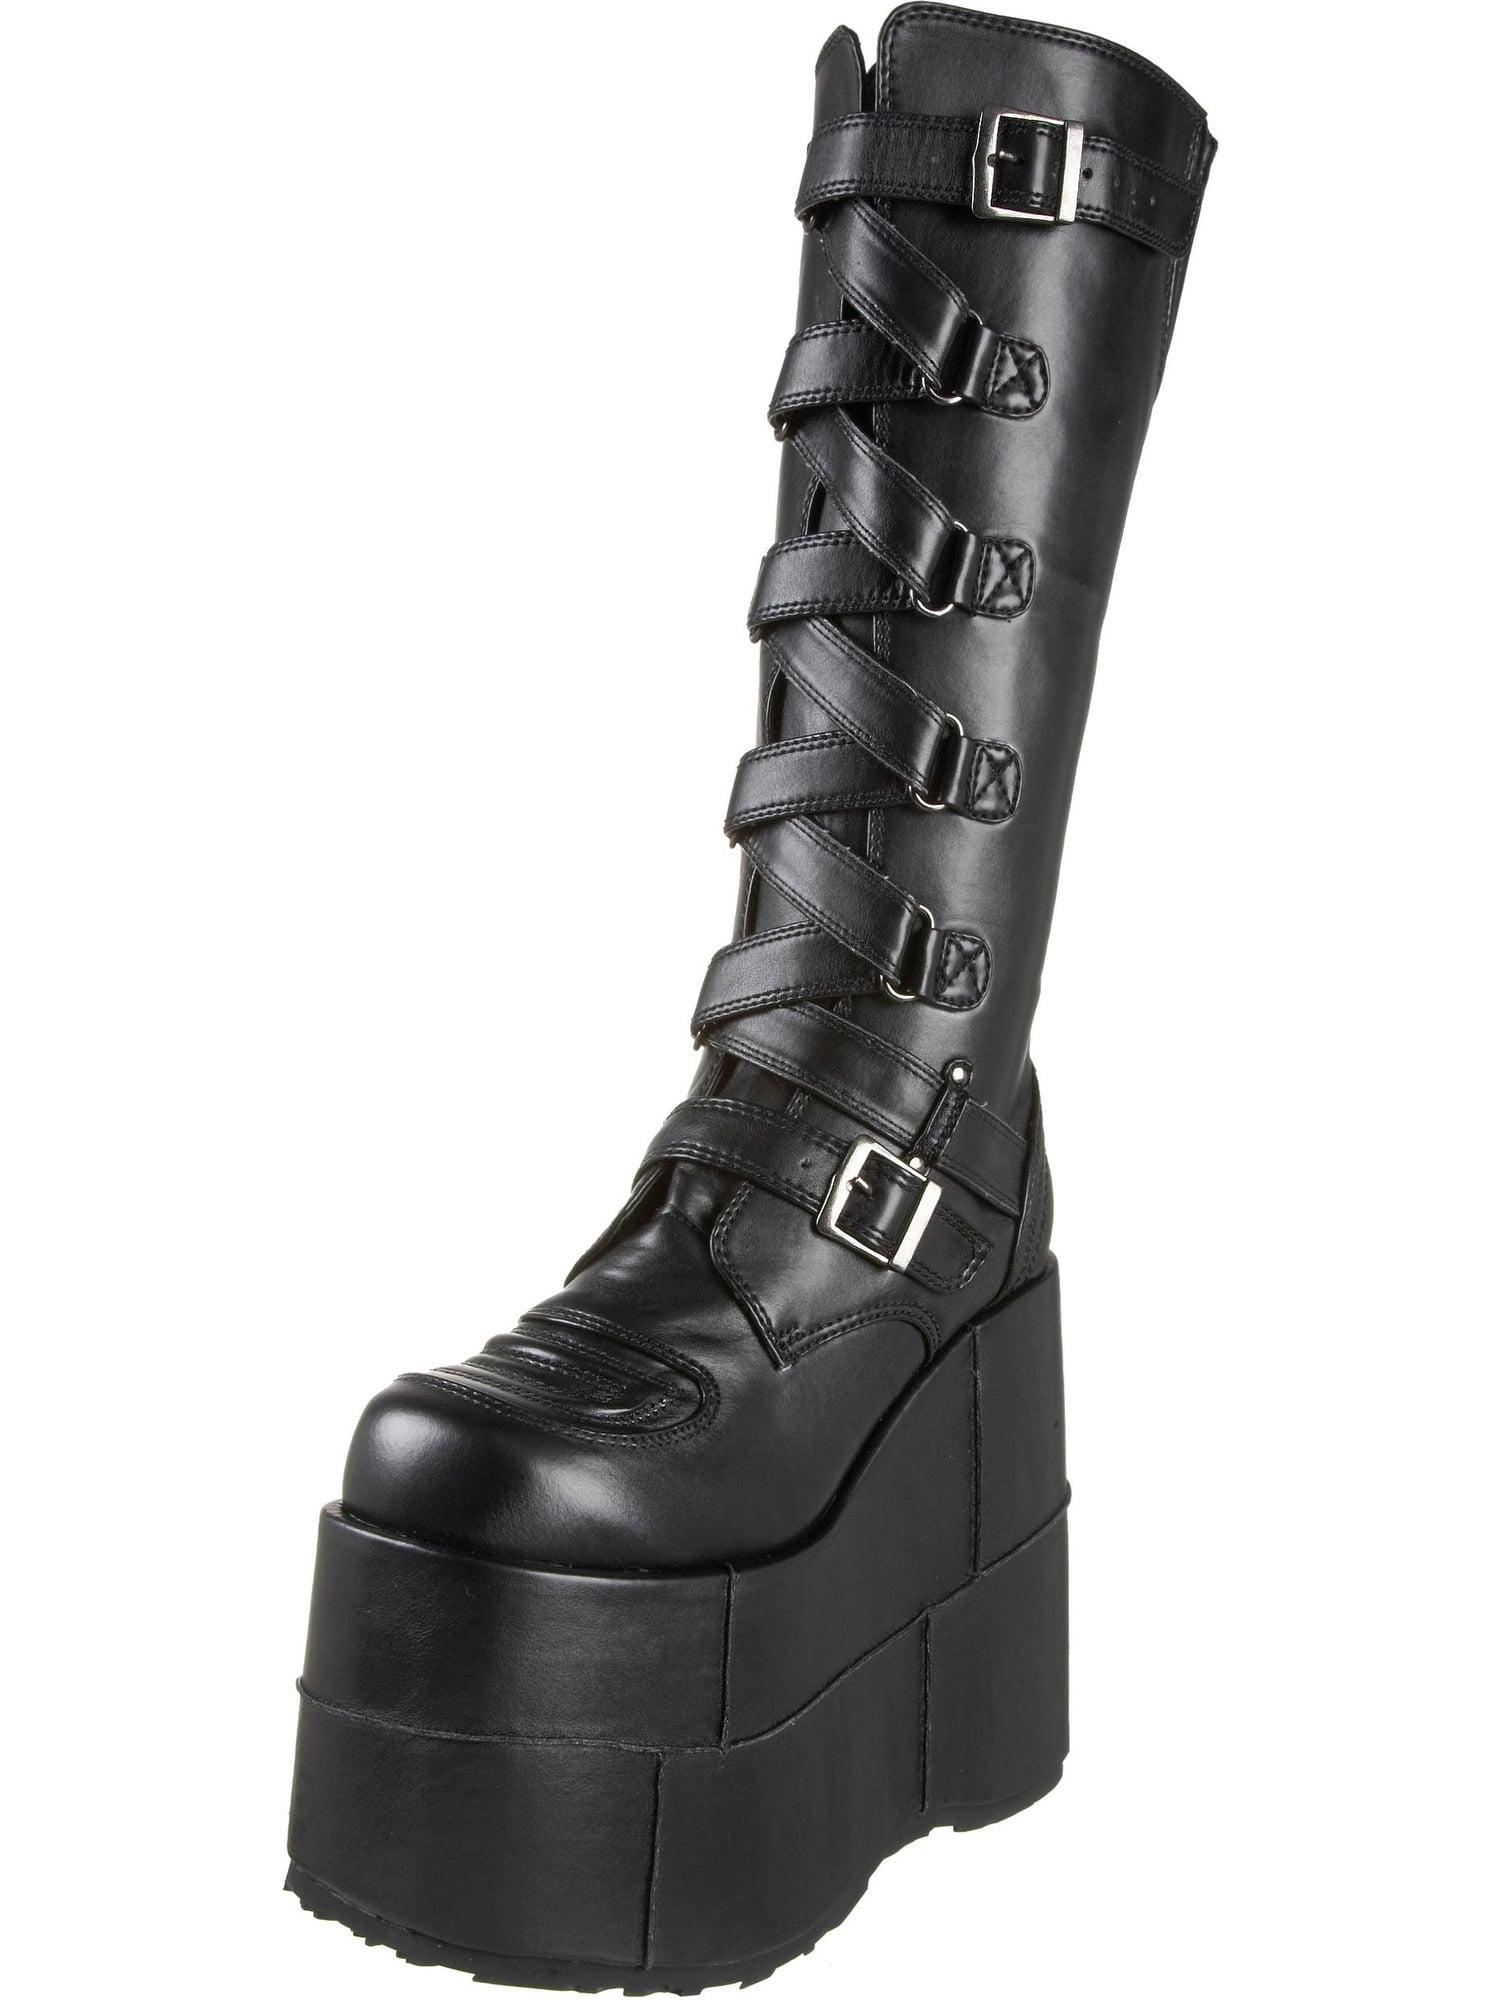 Boots Platform Shoe Zip-Zag Strap Black